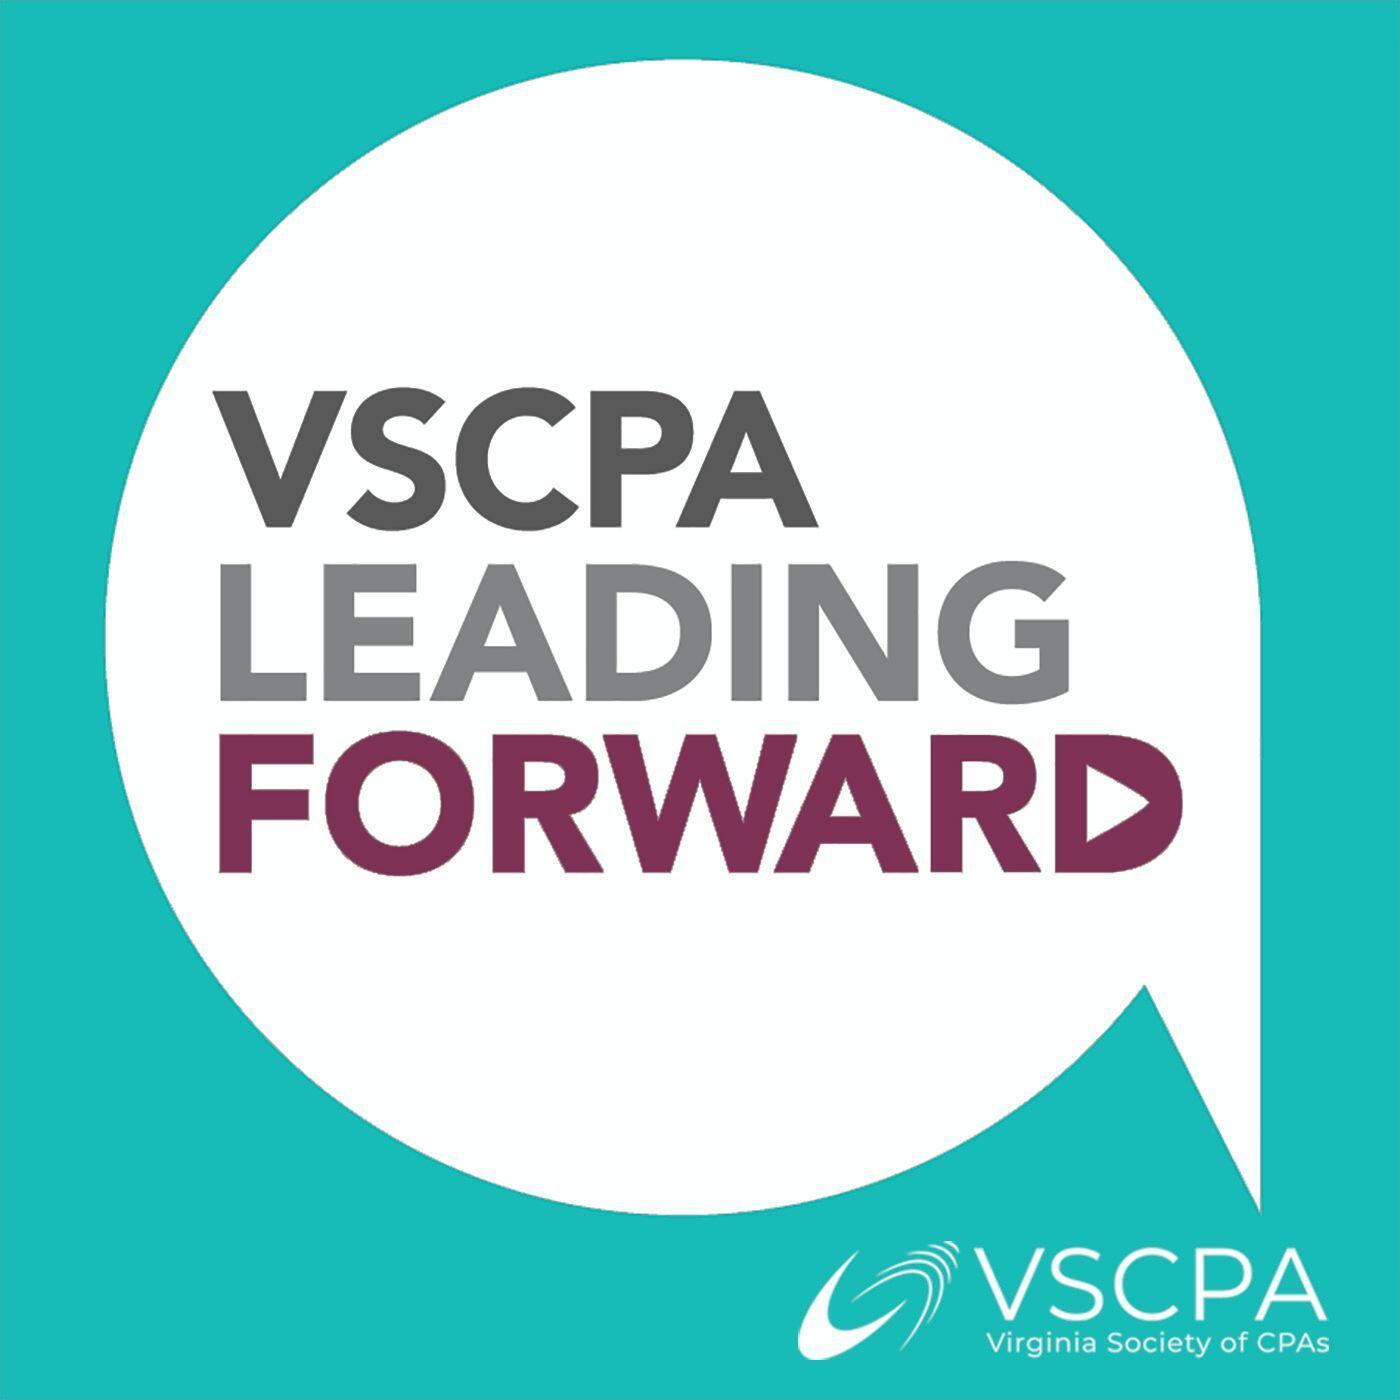 VSCPA Leading Forward